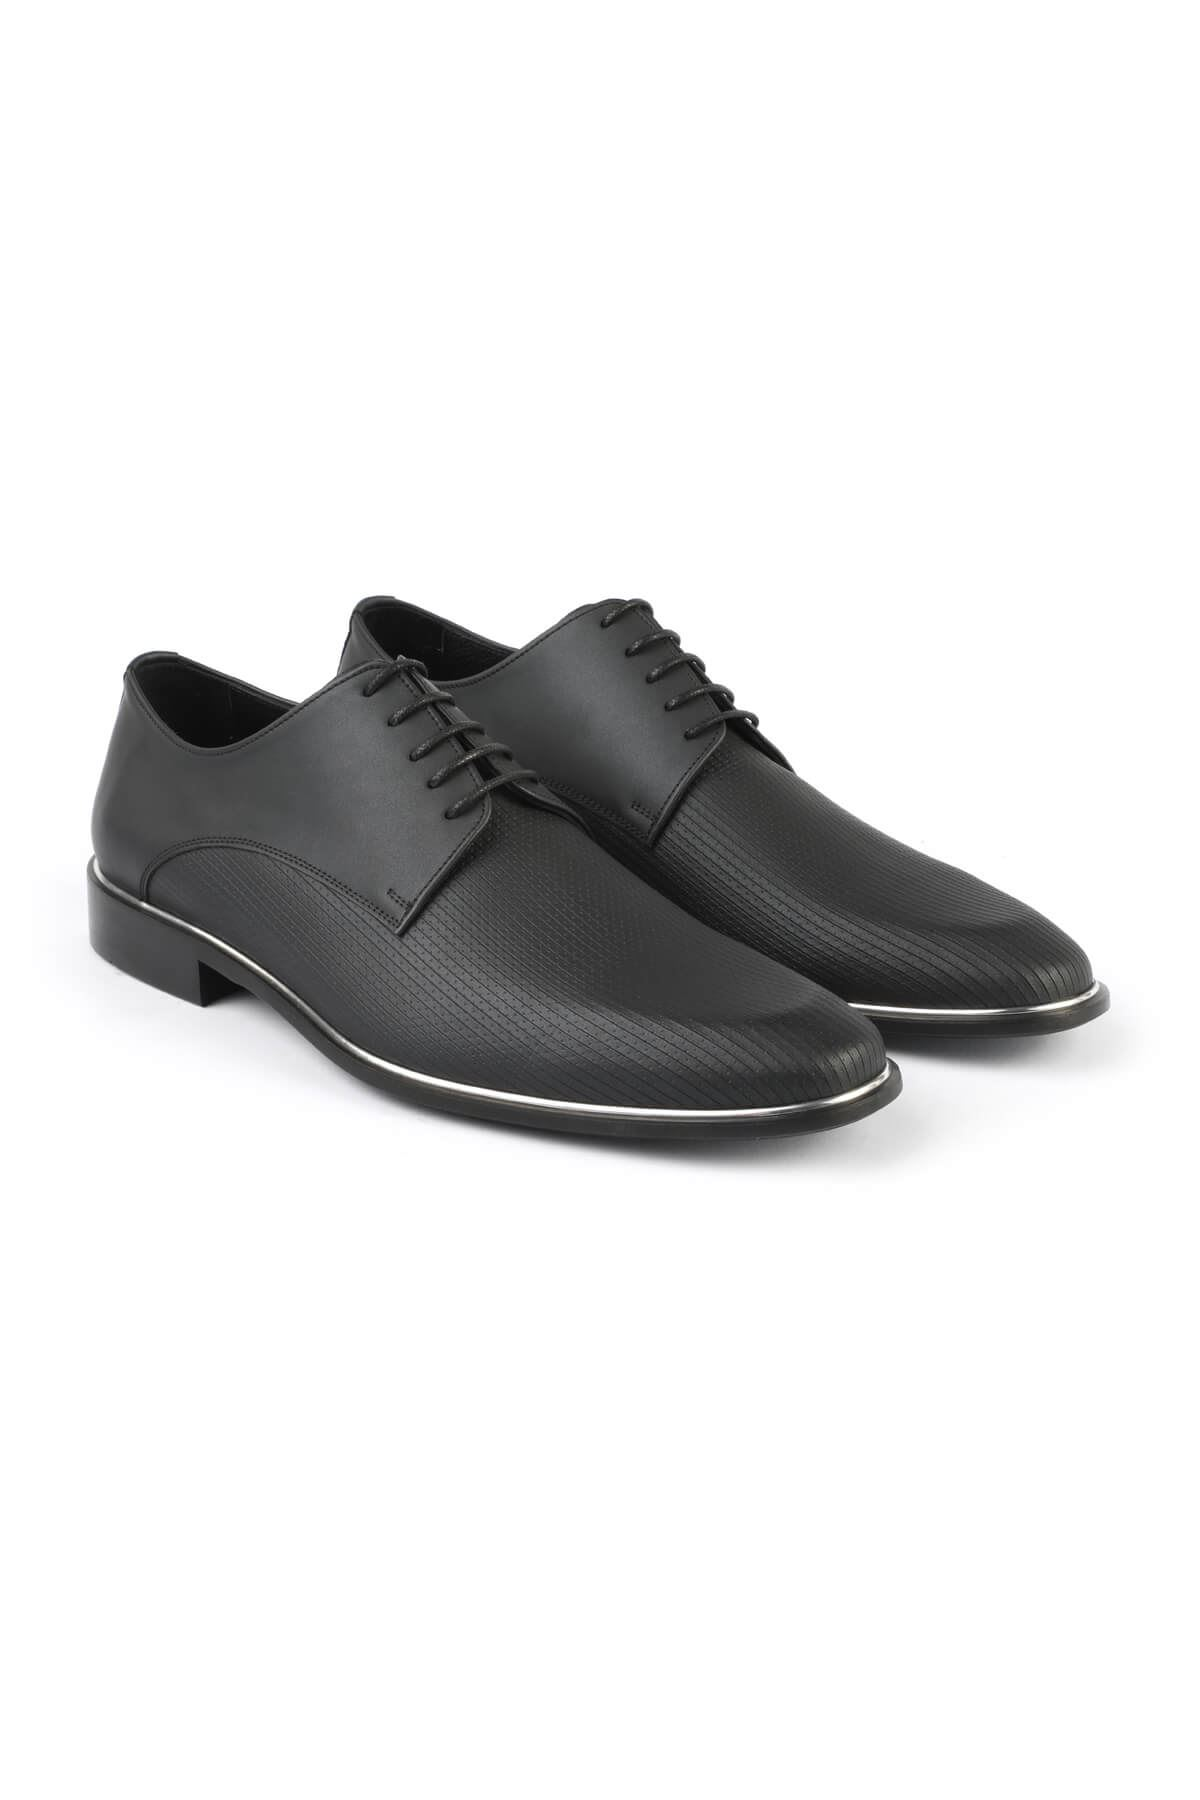 Libero 2982 Black Classic Shoes